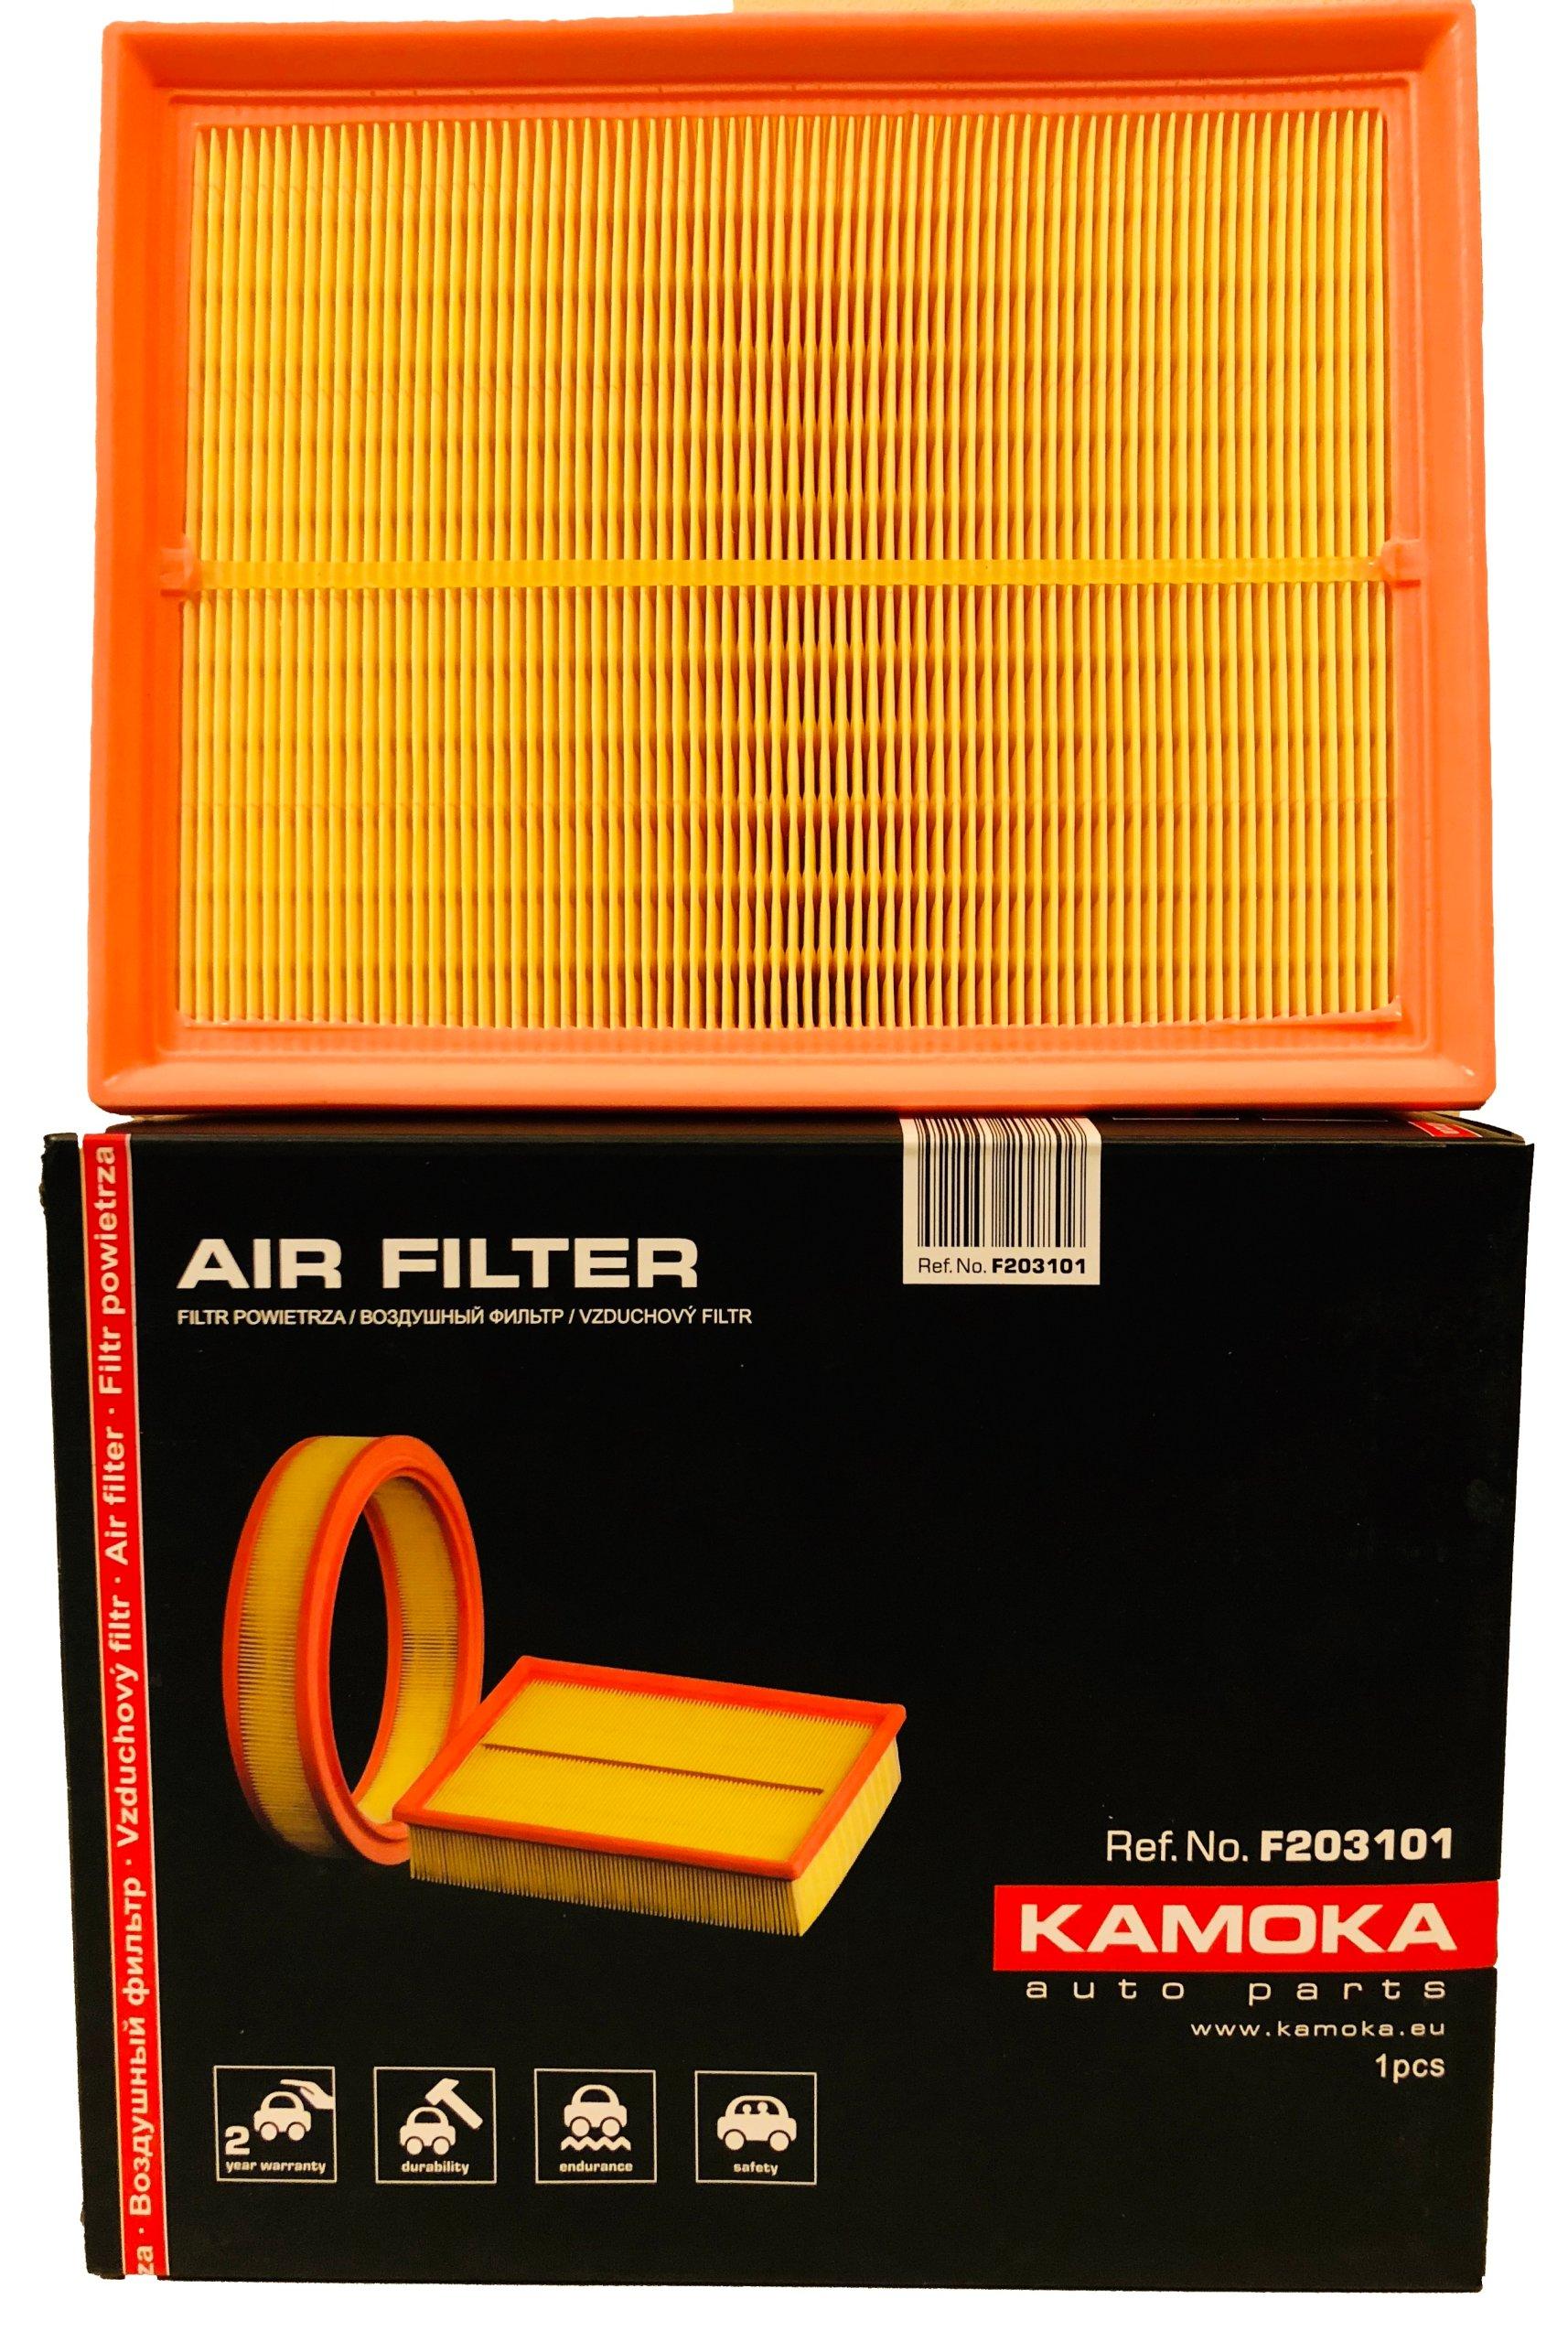 Filtro ARIA AUDI A4 A4 Avant 1.9 3.0 2.5 2.4 3.2 SEAT EXEO ST 1.8 2.0 1.6 EAF422